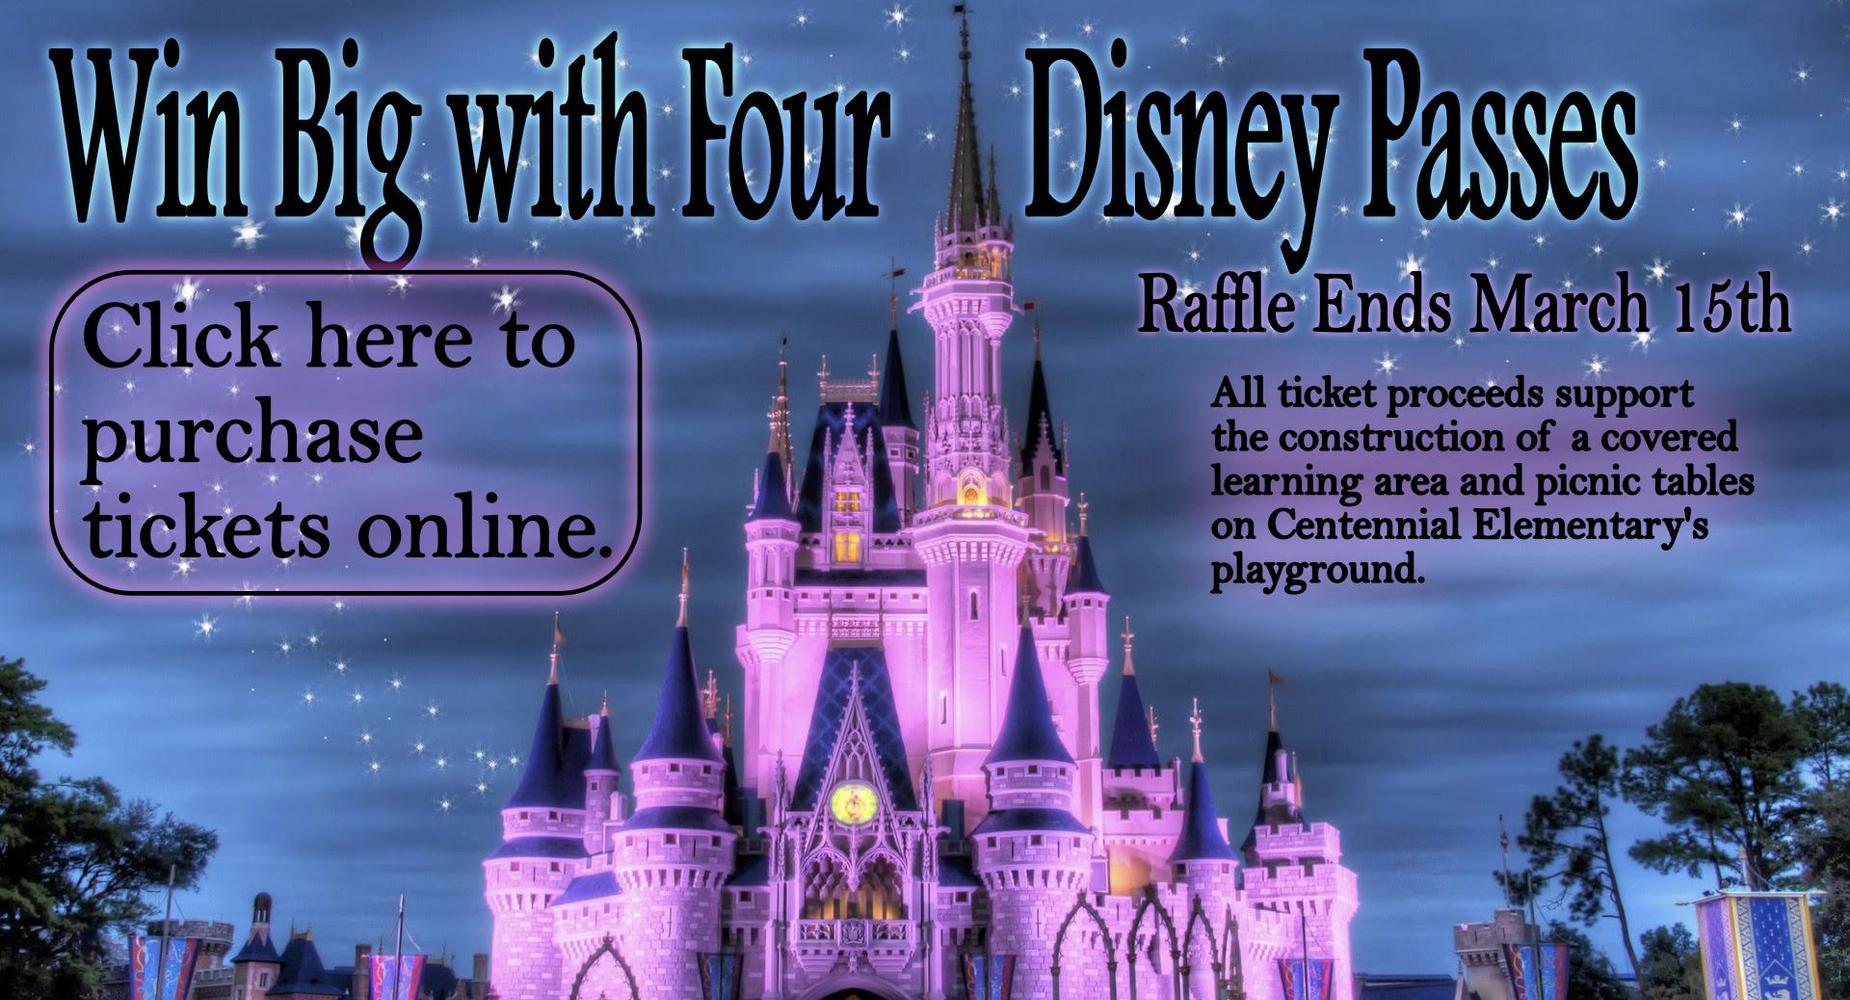 Win Four Disney Passes Raffle - Ends 3/15/19